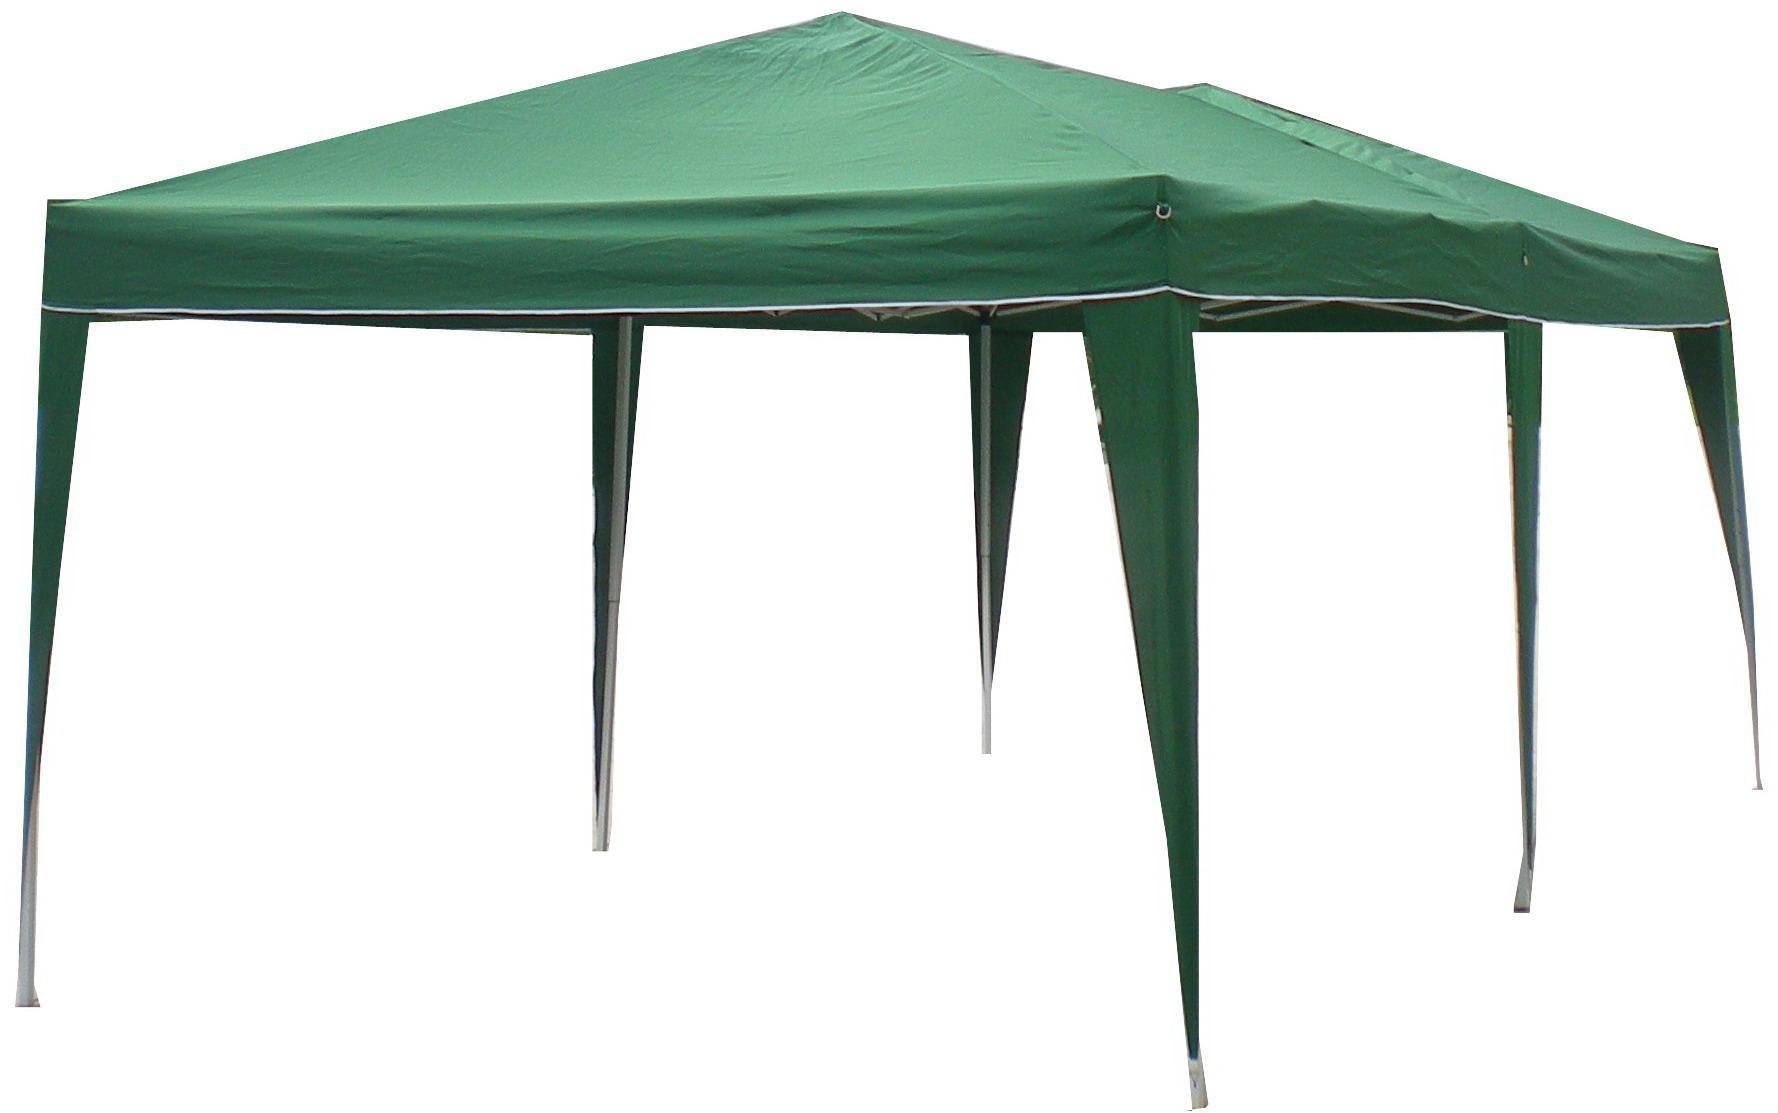 Hot Selling Outdoor Market Umbrella Full Iron Folding Dark Green Tent